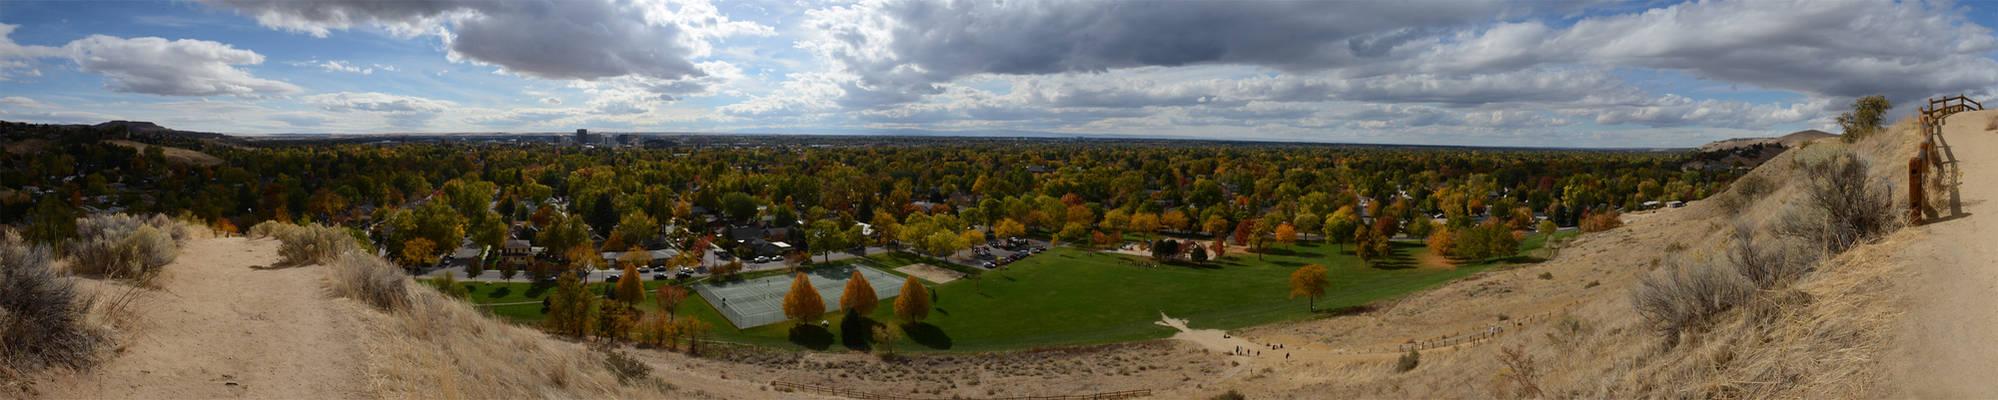 Camelback Park Fall 2012-10-20 1